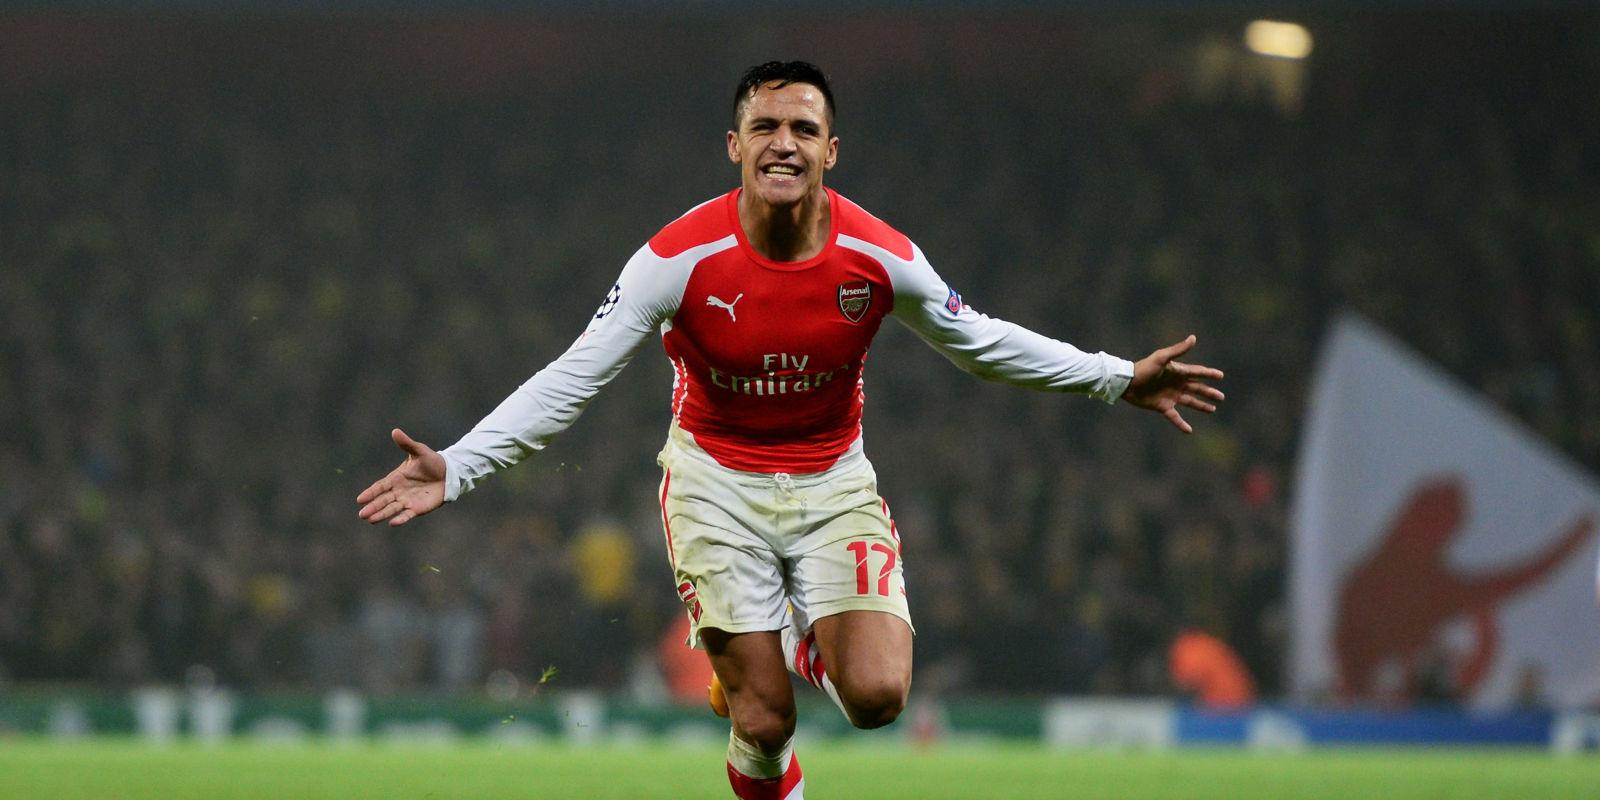 Arsenal s Alexis Sanchez Doesn t Talk To His Teammates